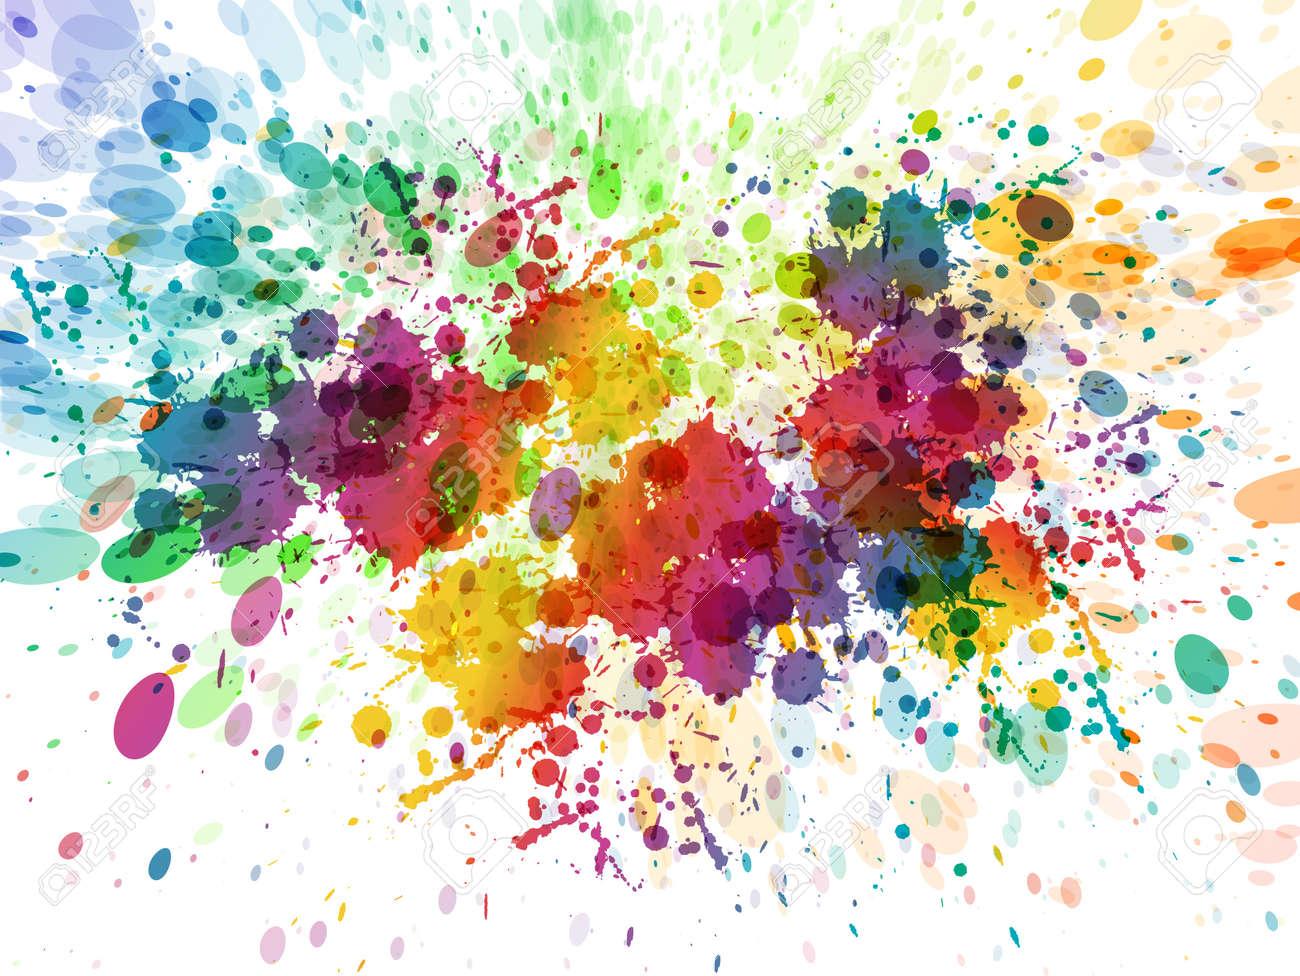 Colorful Background Colorful Background Hd Colorful Background